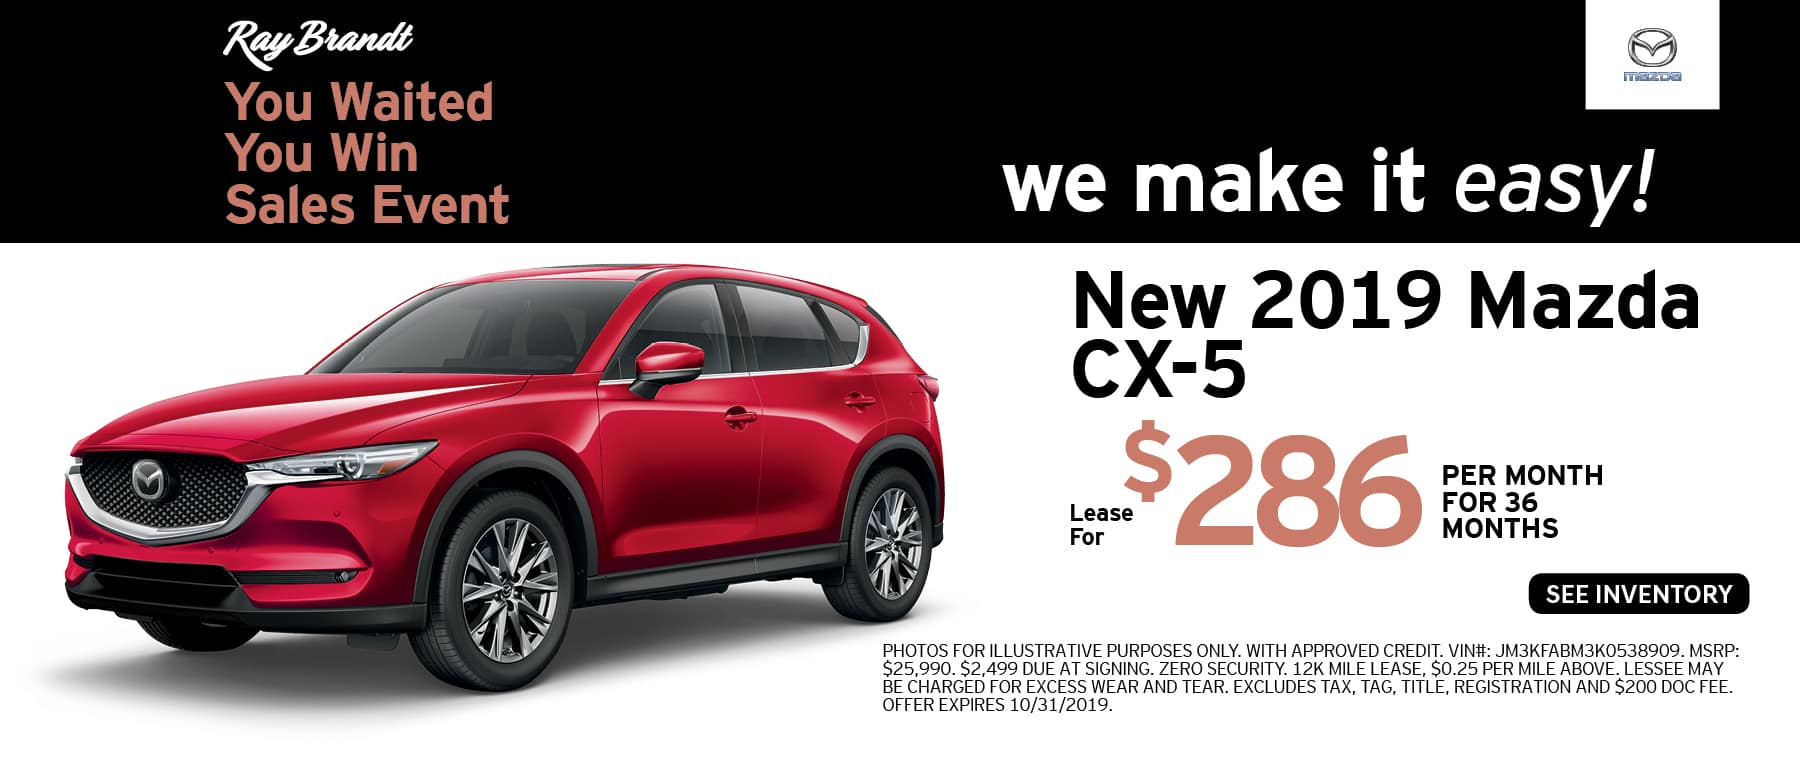 CX5 SPECIAL